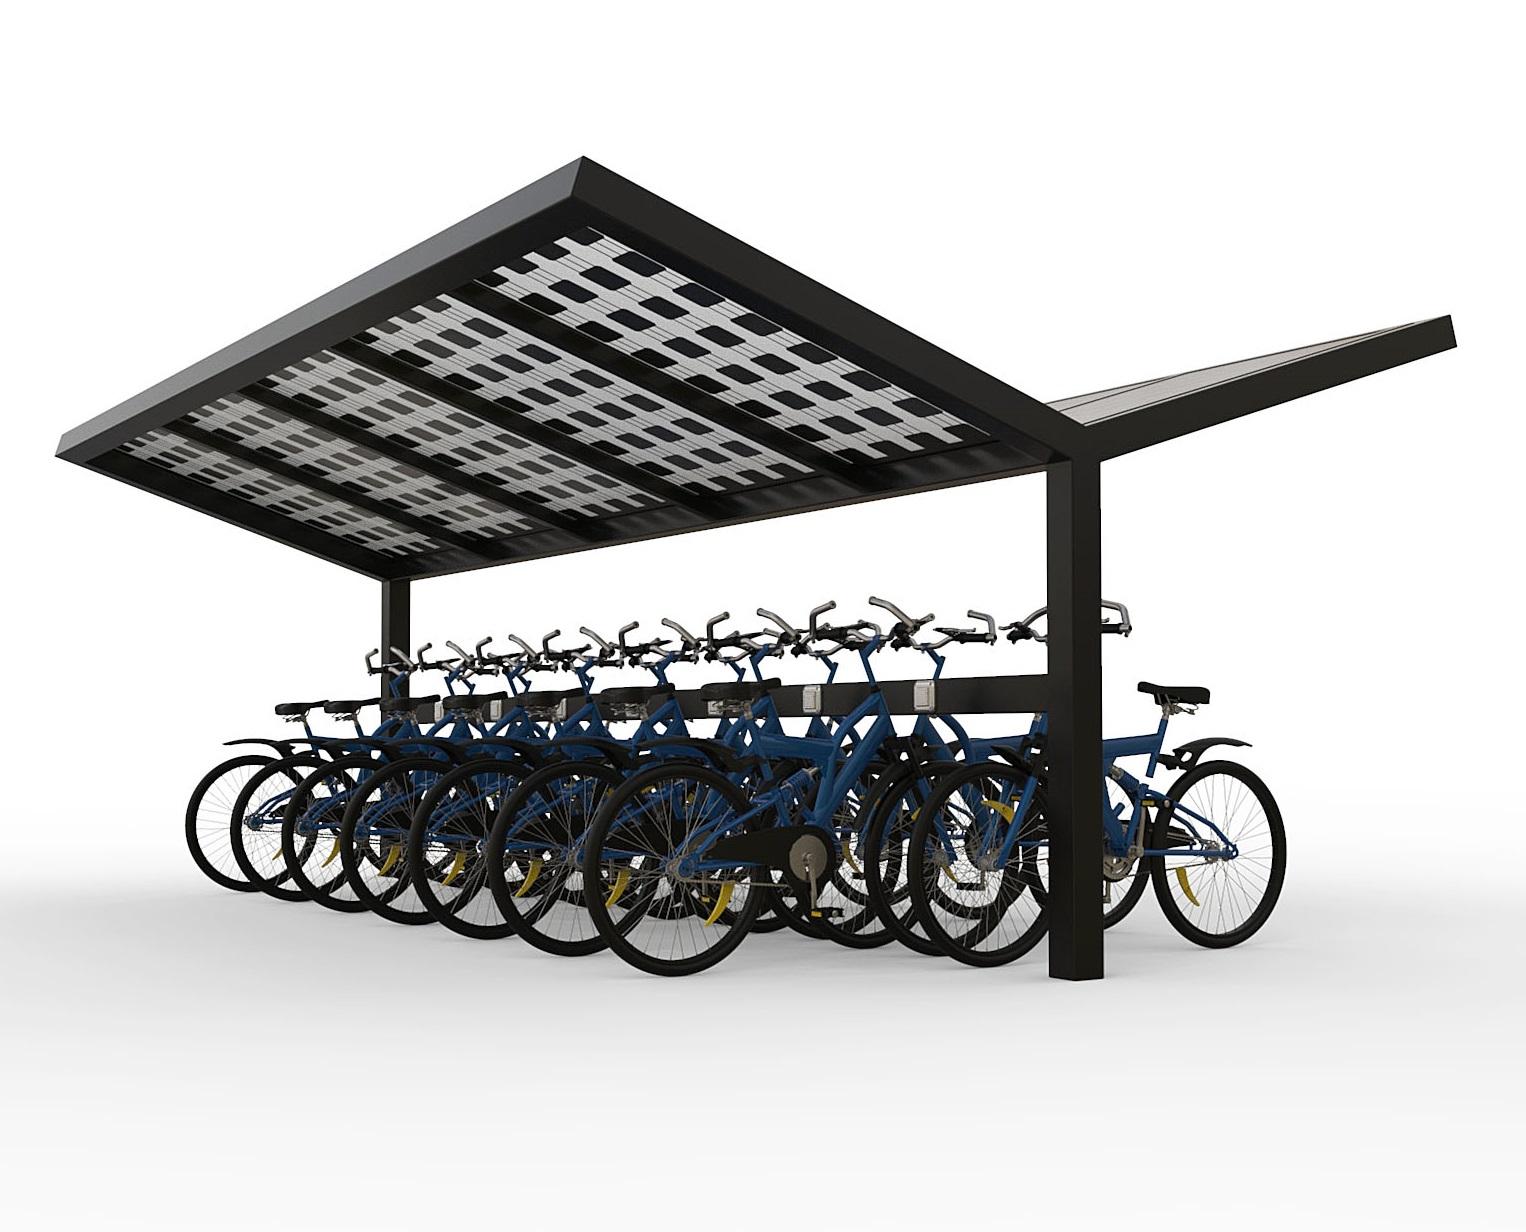 Solar fietsenstalling zonnepanelen dak